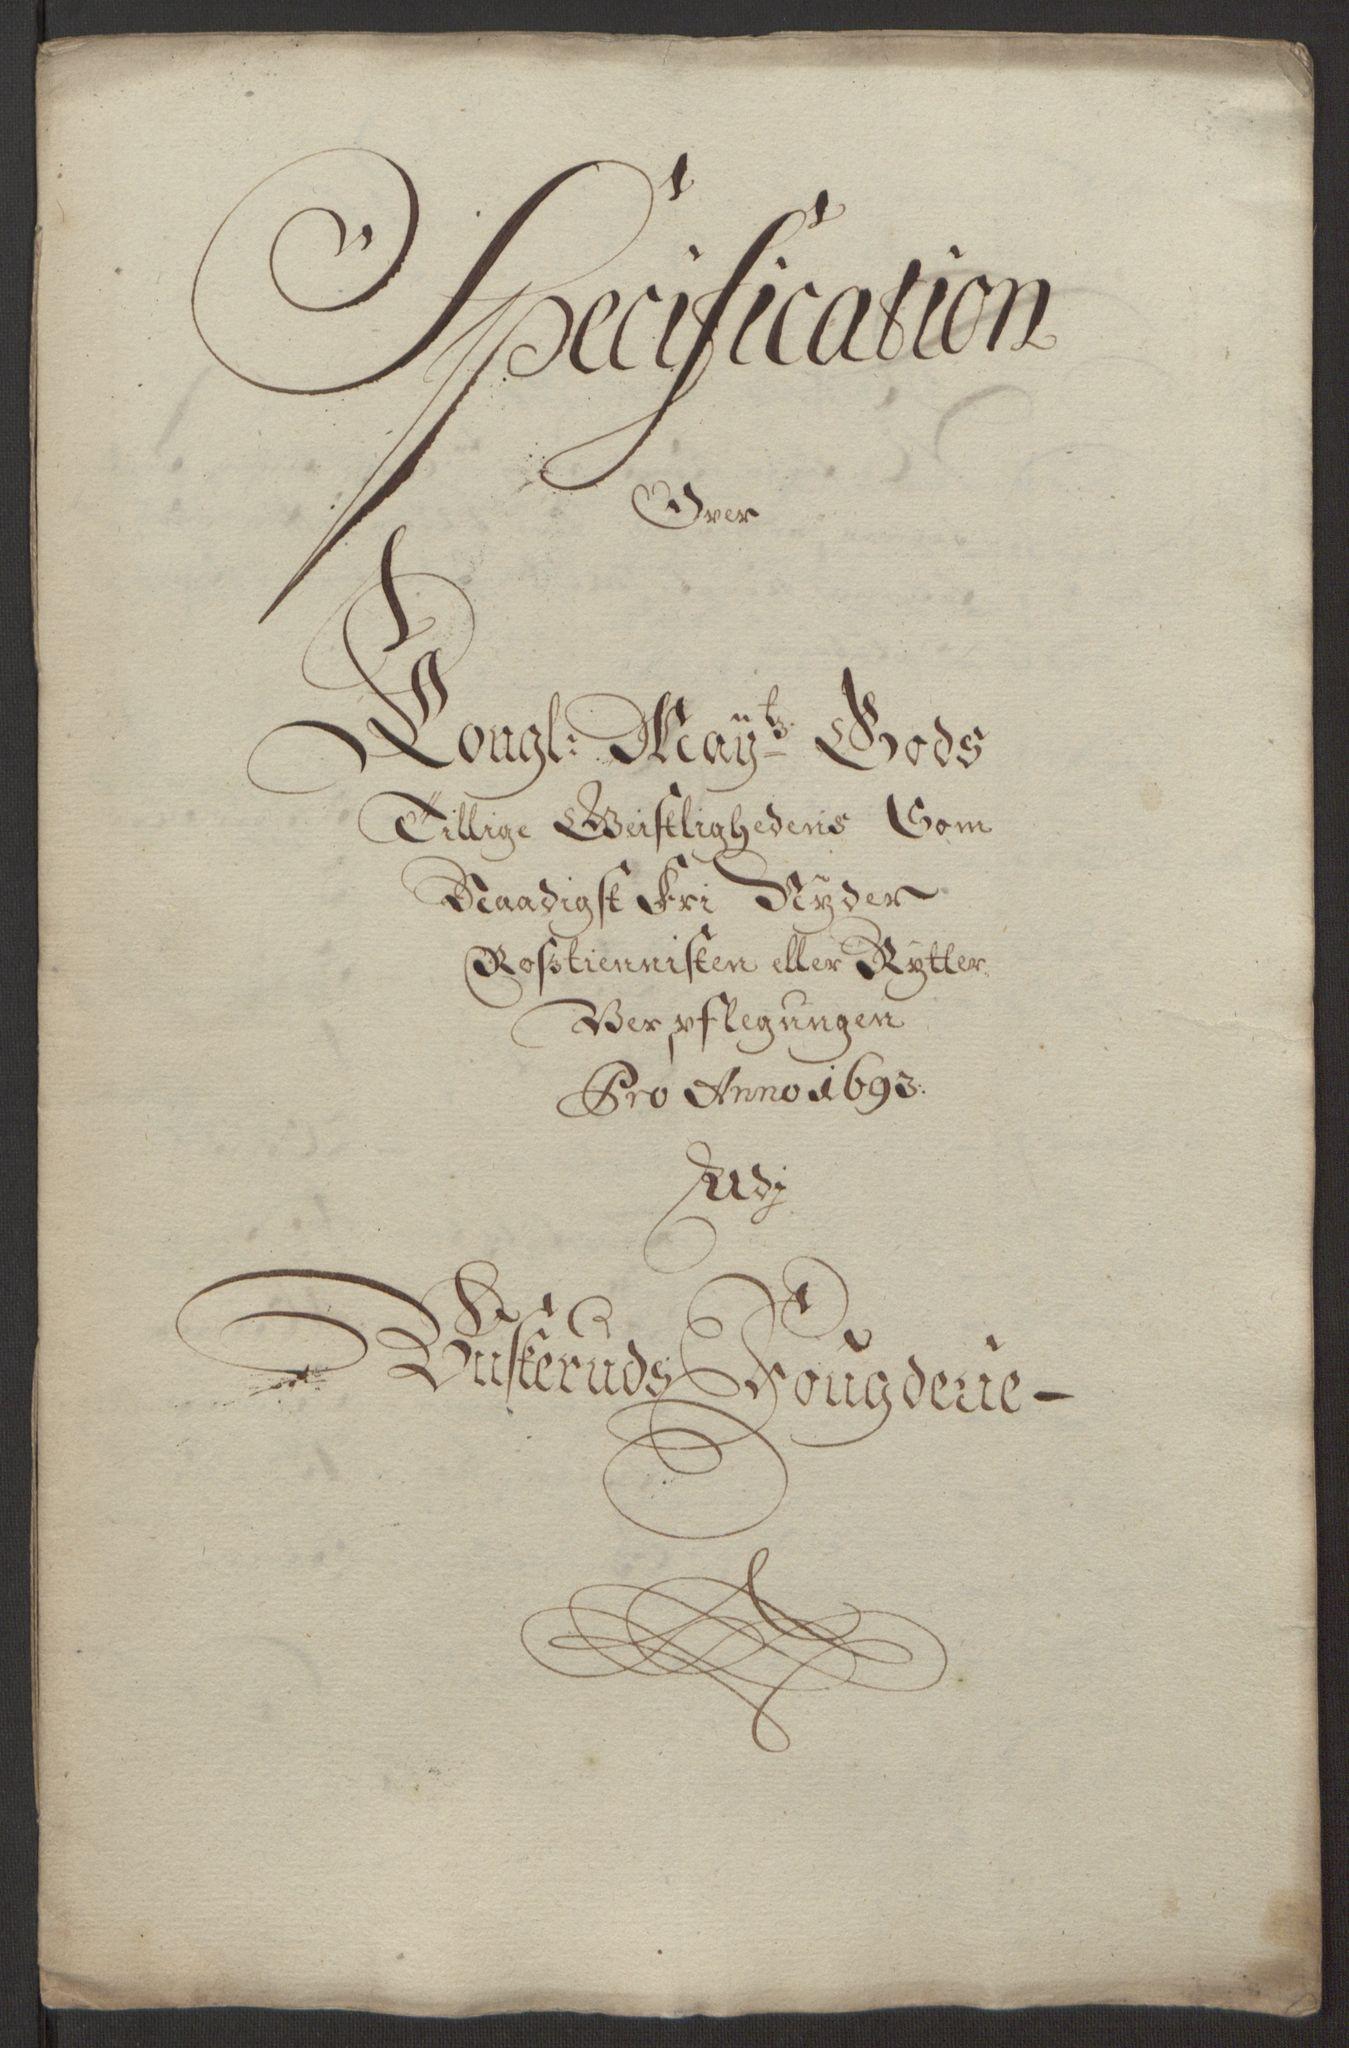 RA, Rentekammeret inntil 1814, Reviderte regnskaper, Fogderegnskap, R25/L1682: Fogderegnskap Buskerud, 1693, s. 232